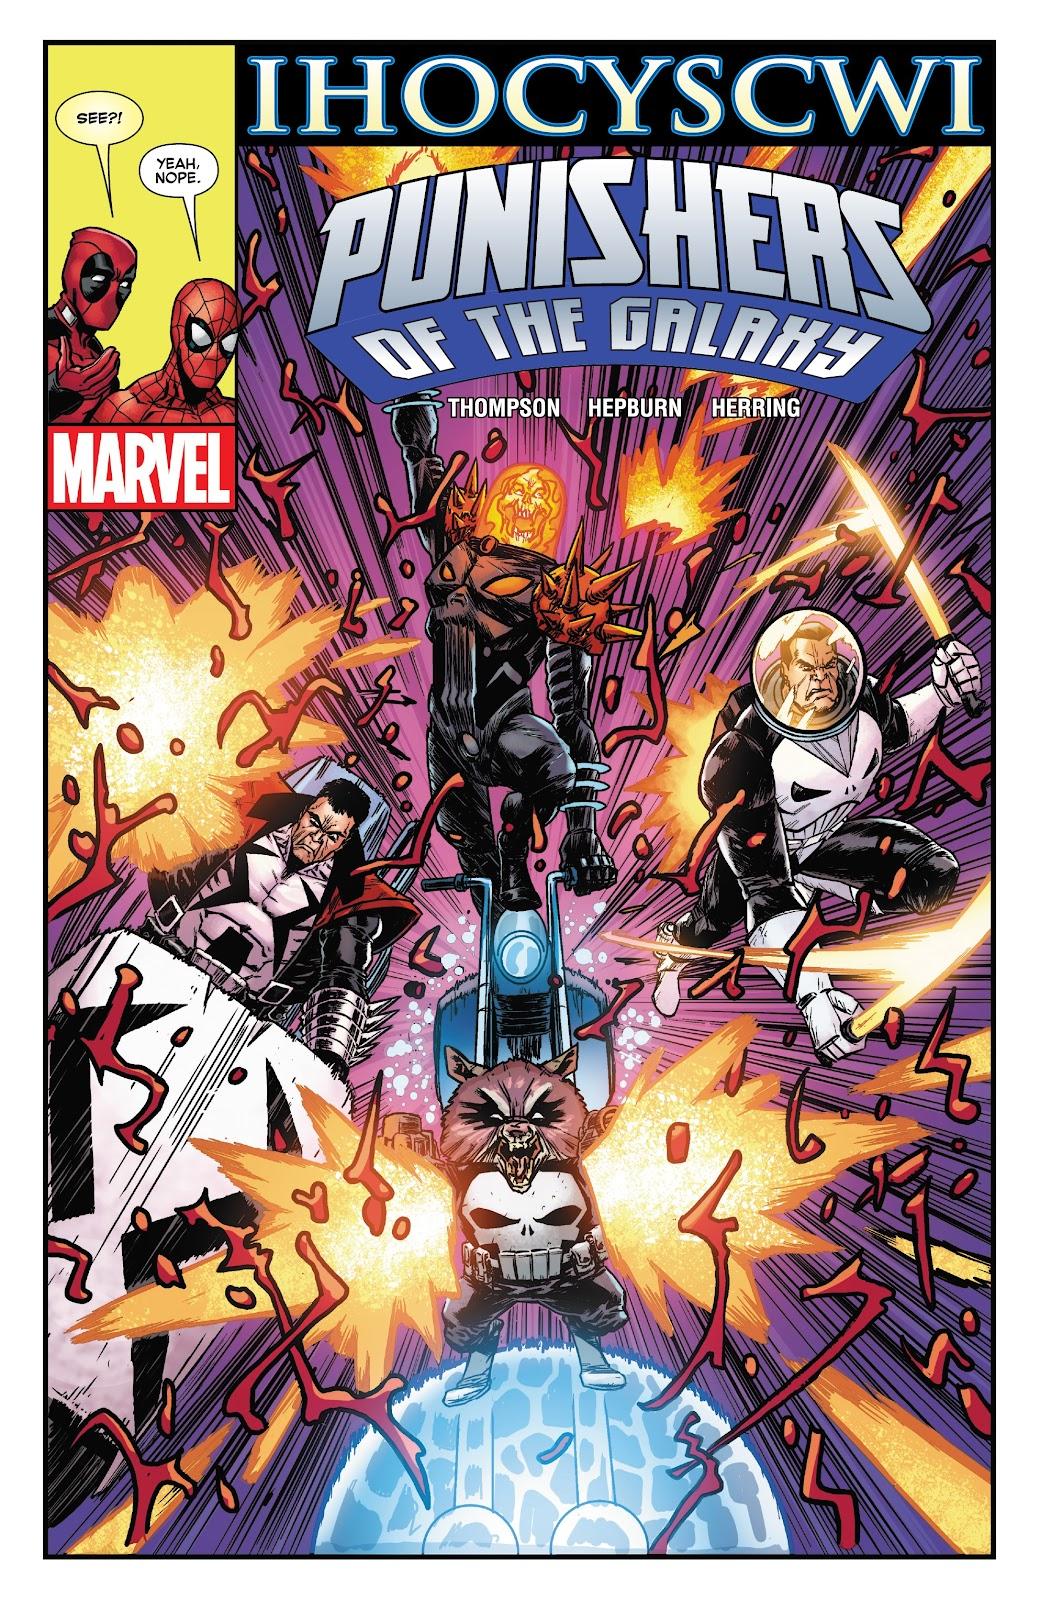 Read online Spider-Man/Deadpool comic -  Issue #50 - 19